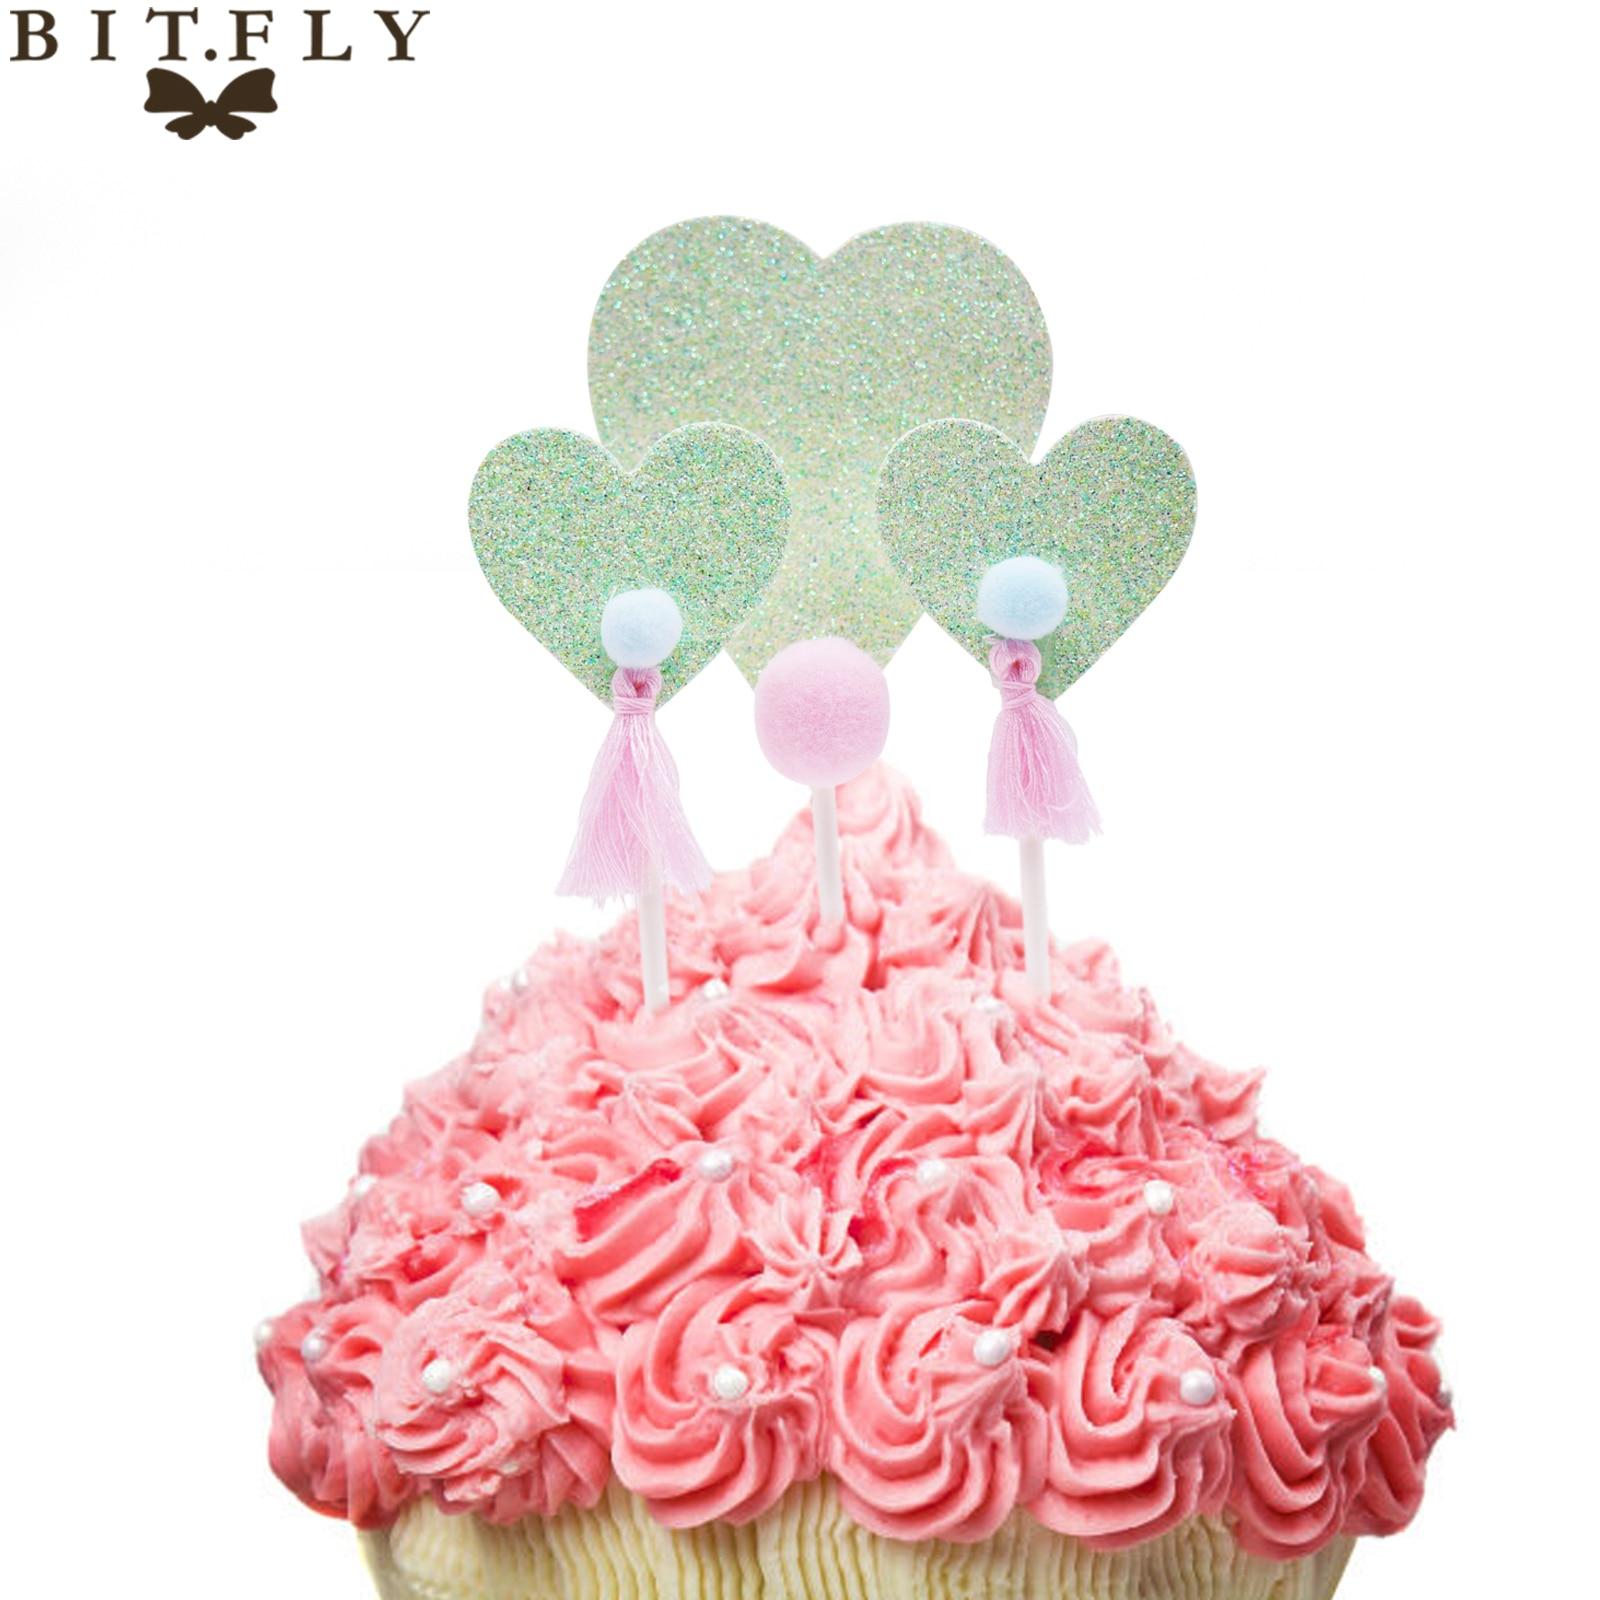 BITFLY 3pcs Lovely Heart Cupcake Toppers Birthday Cakes Flag Kids